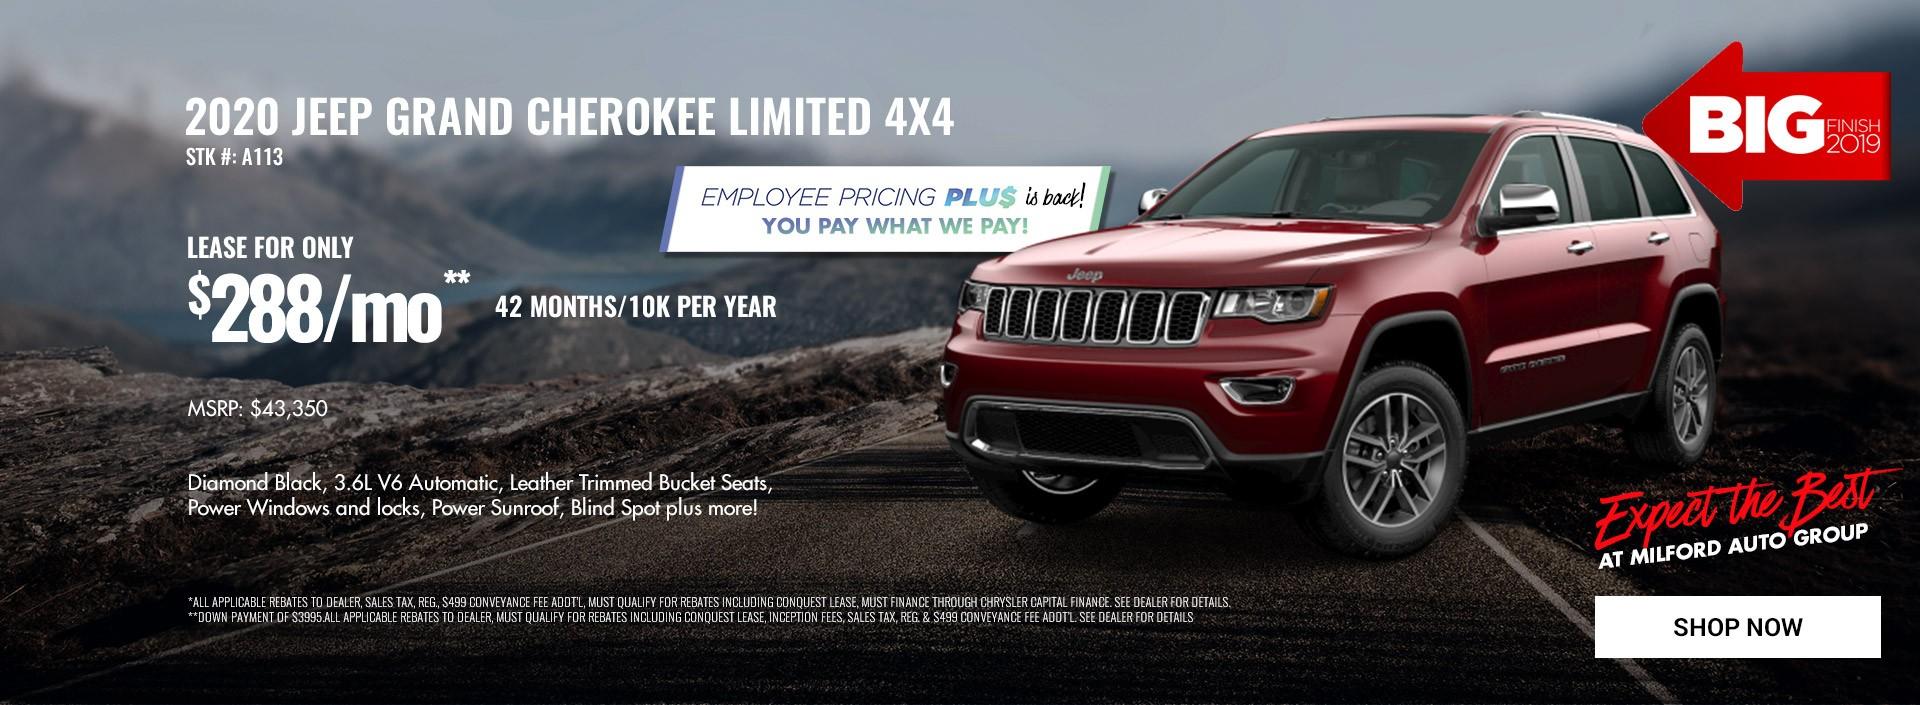 2020 Jeep Grand Cherokee Limited 4x4